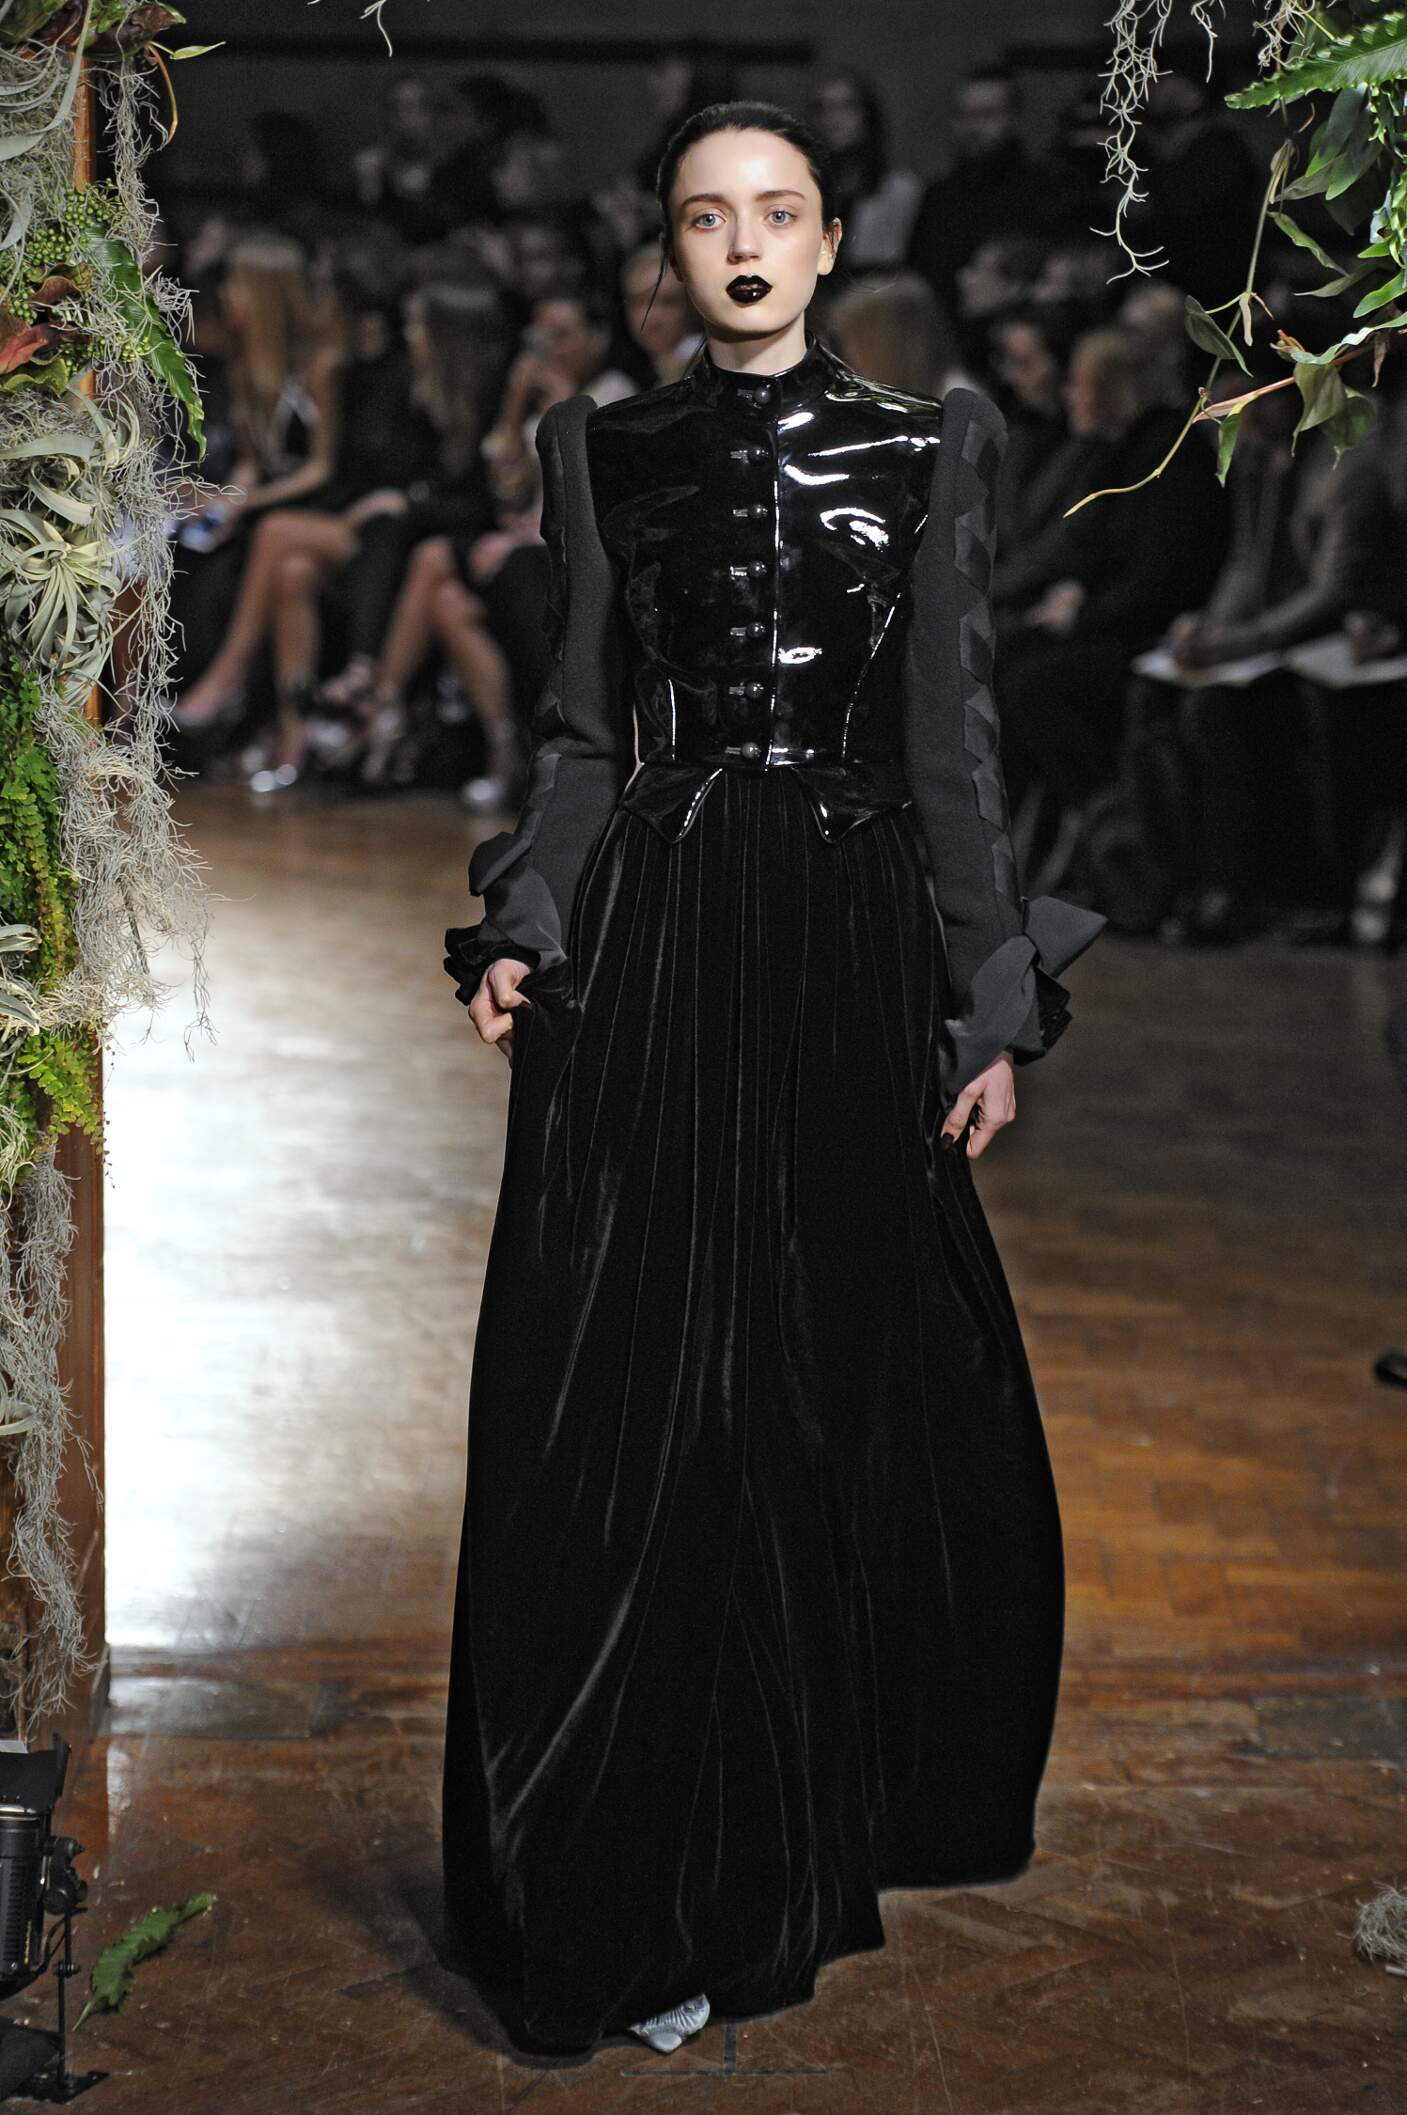 Catwalk Giles Womenswear Collection Winter 2015